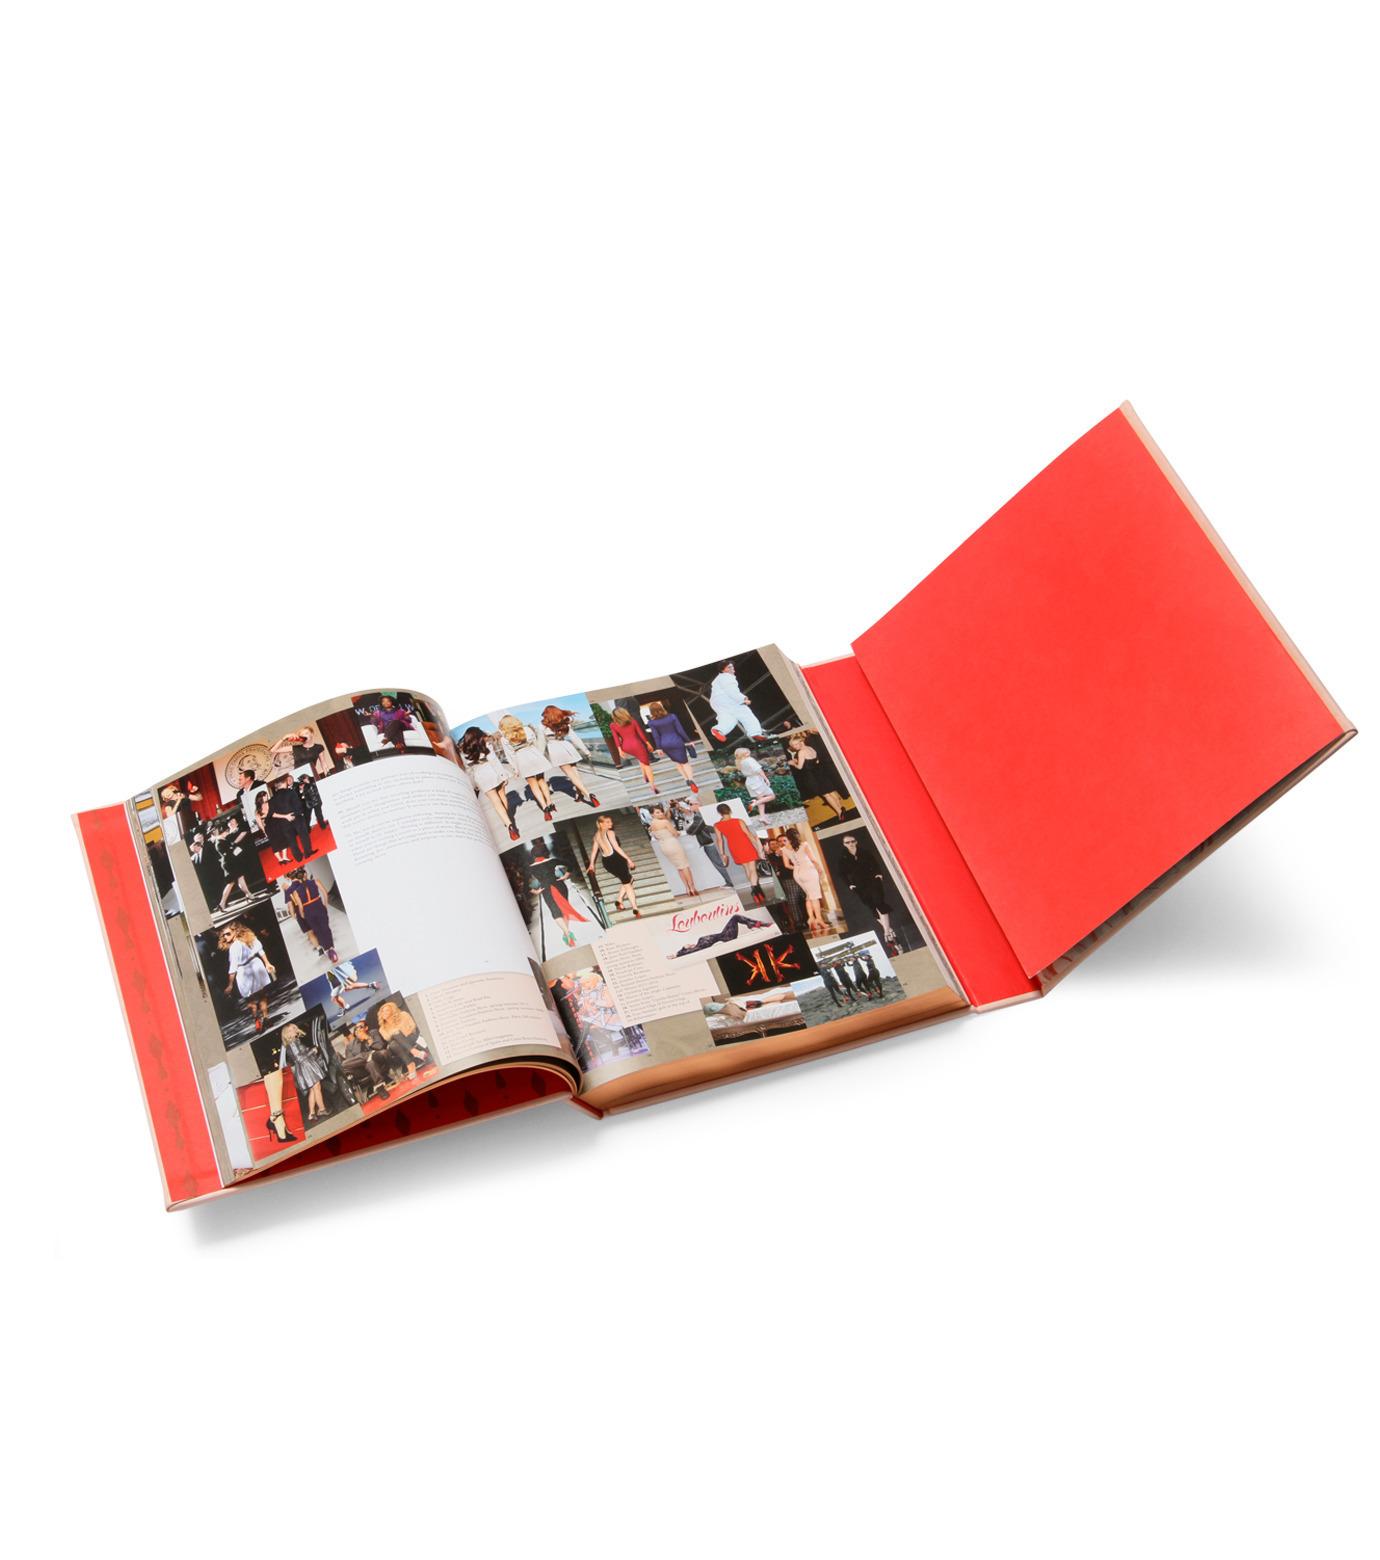 ArtBook(アートブック)のChristian Louboutin-SALMON PINK(インテリア/OTHER-GOODS/interior/OTHER-GOODS)-8478-3651-7-73 拡大詳細画像2